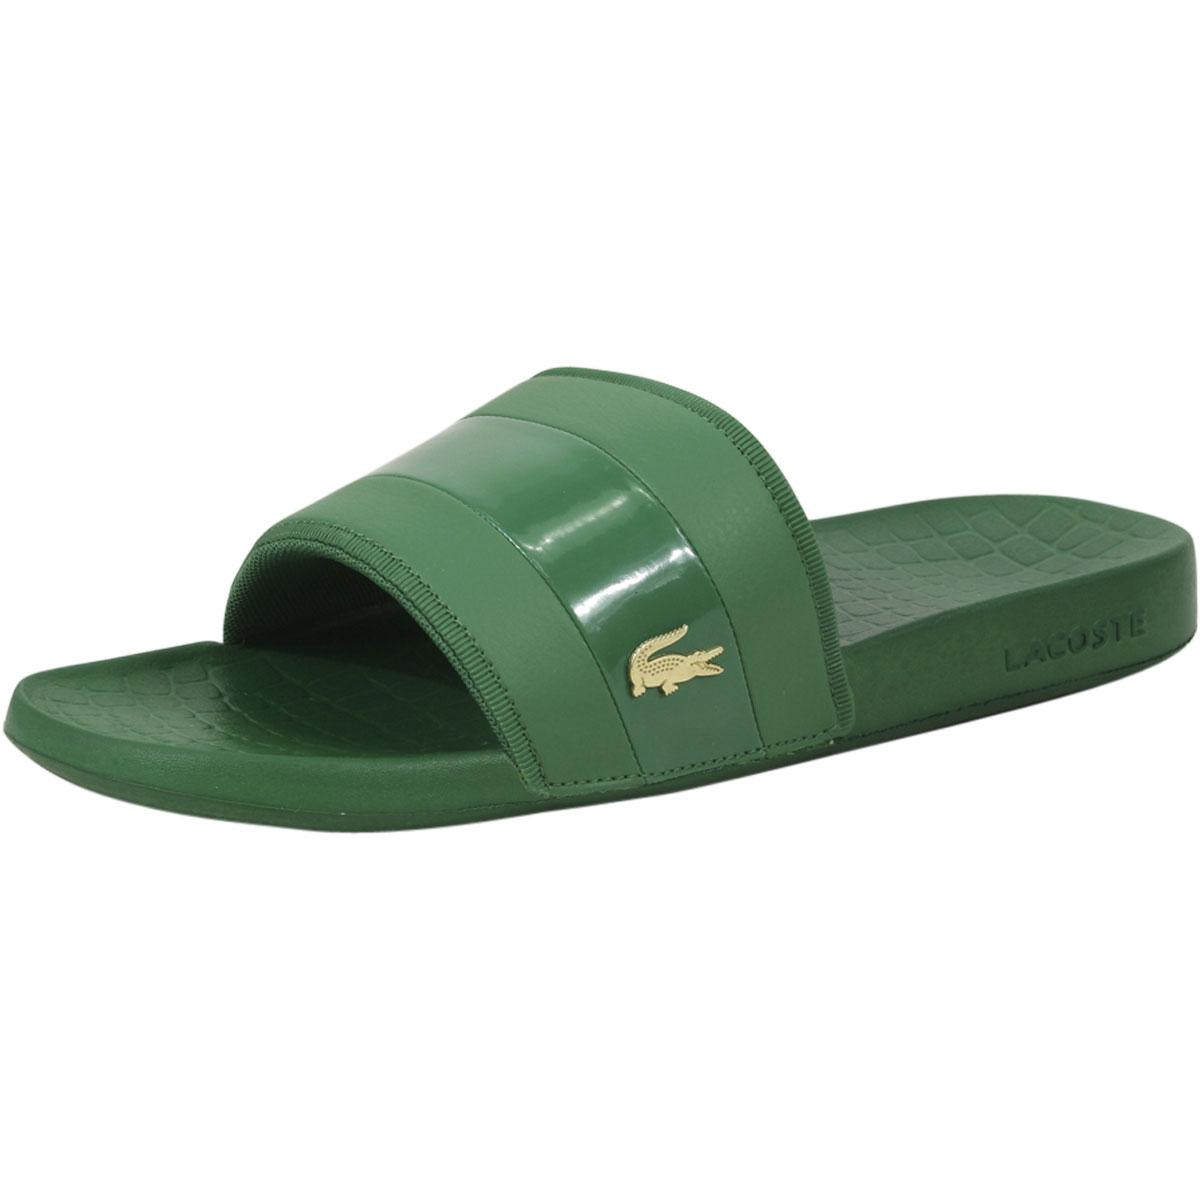 Lacoste Men's Frasier-118 Logo Slides Sandals Shoes